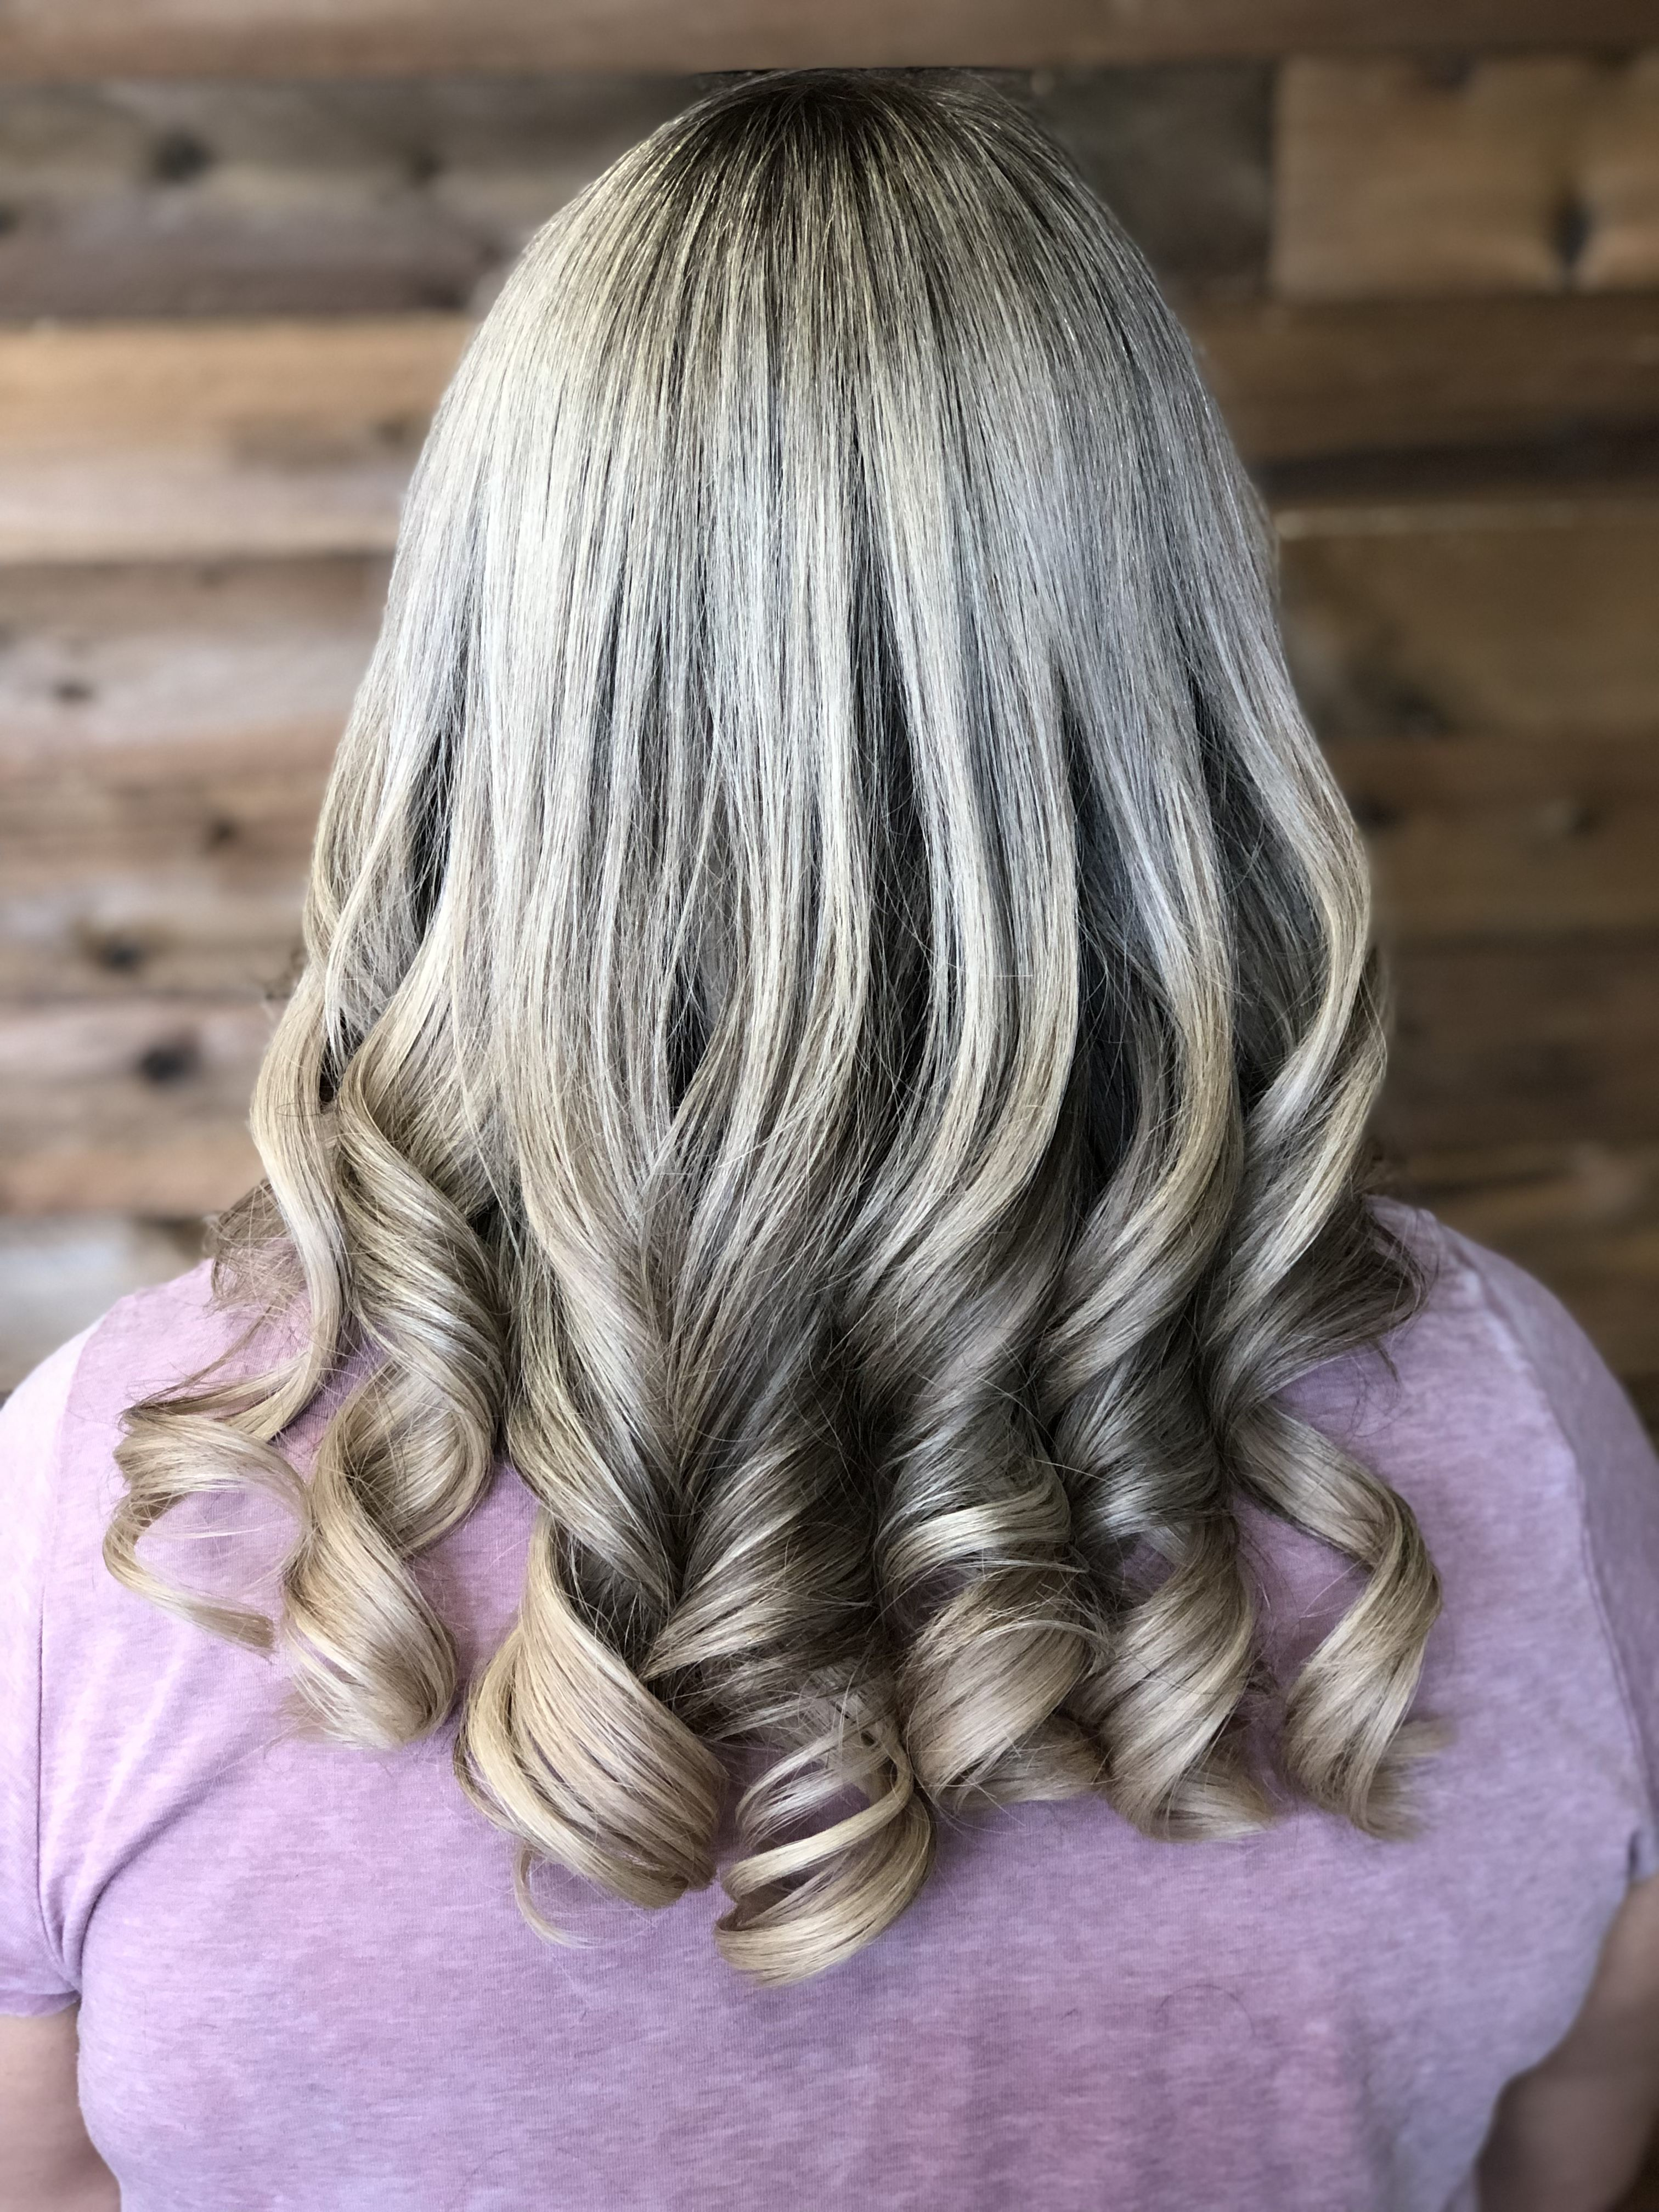 Quinn Blakey Hairdressing On Instagram Ghd Curved Long Hair Styles Hair Styles Hairdresser